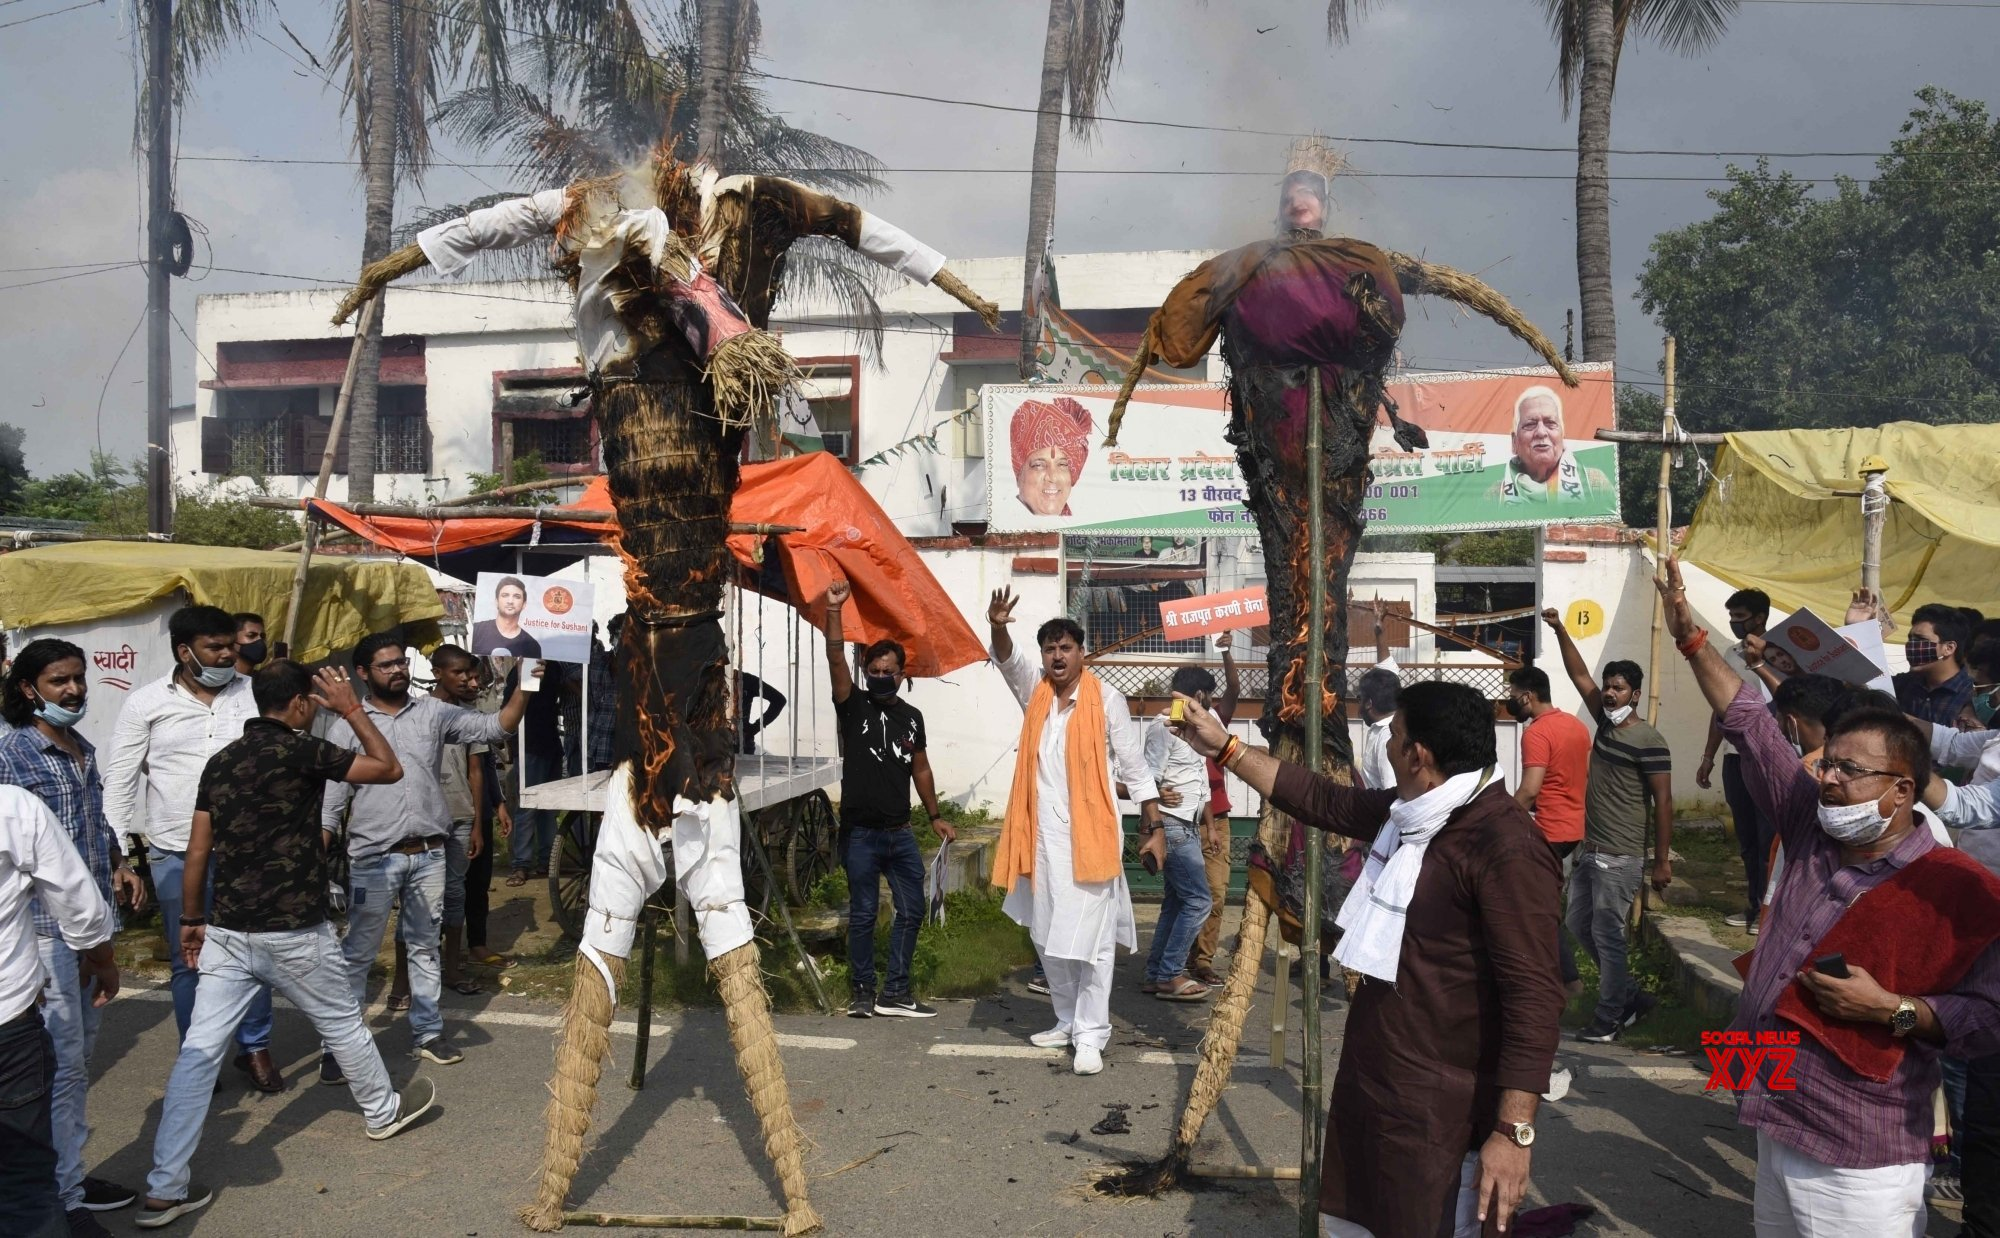 Patna: Karni Sena demands CBI probe in Sushant Singh Rajput's death #Gallery